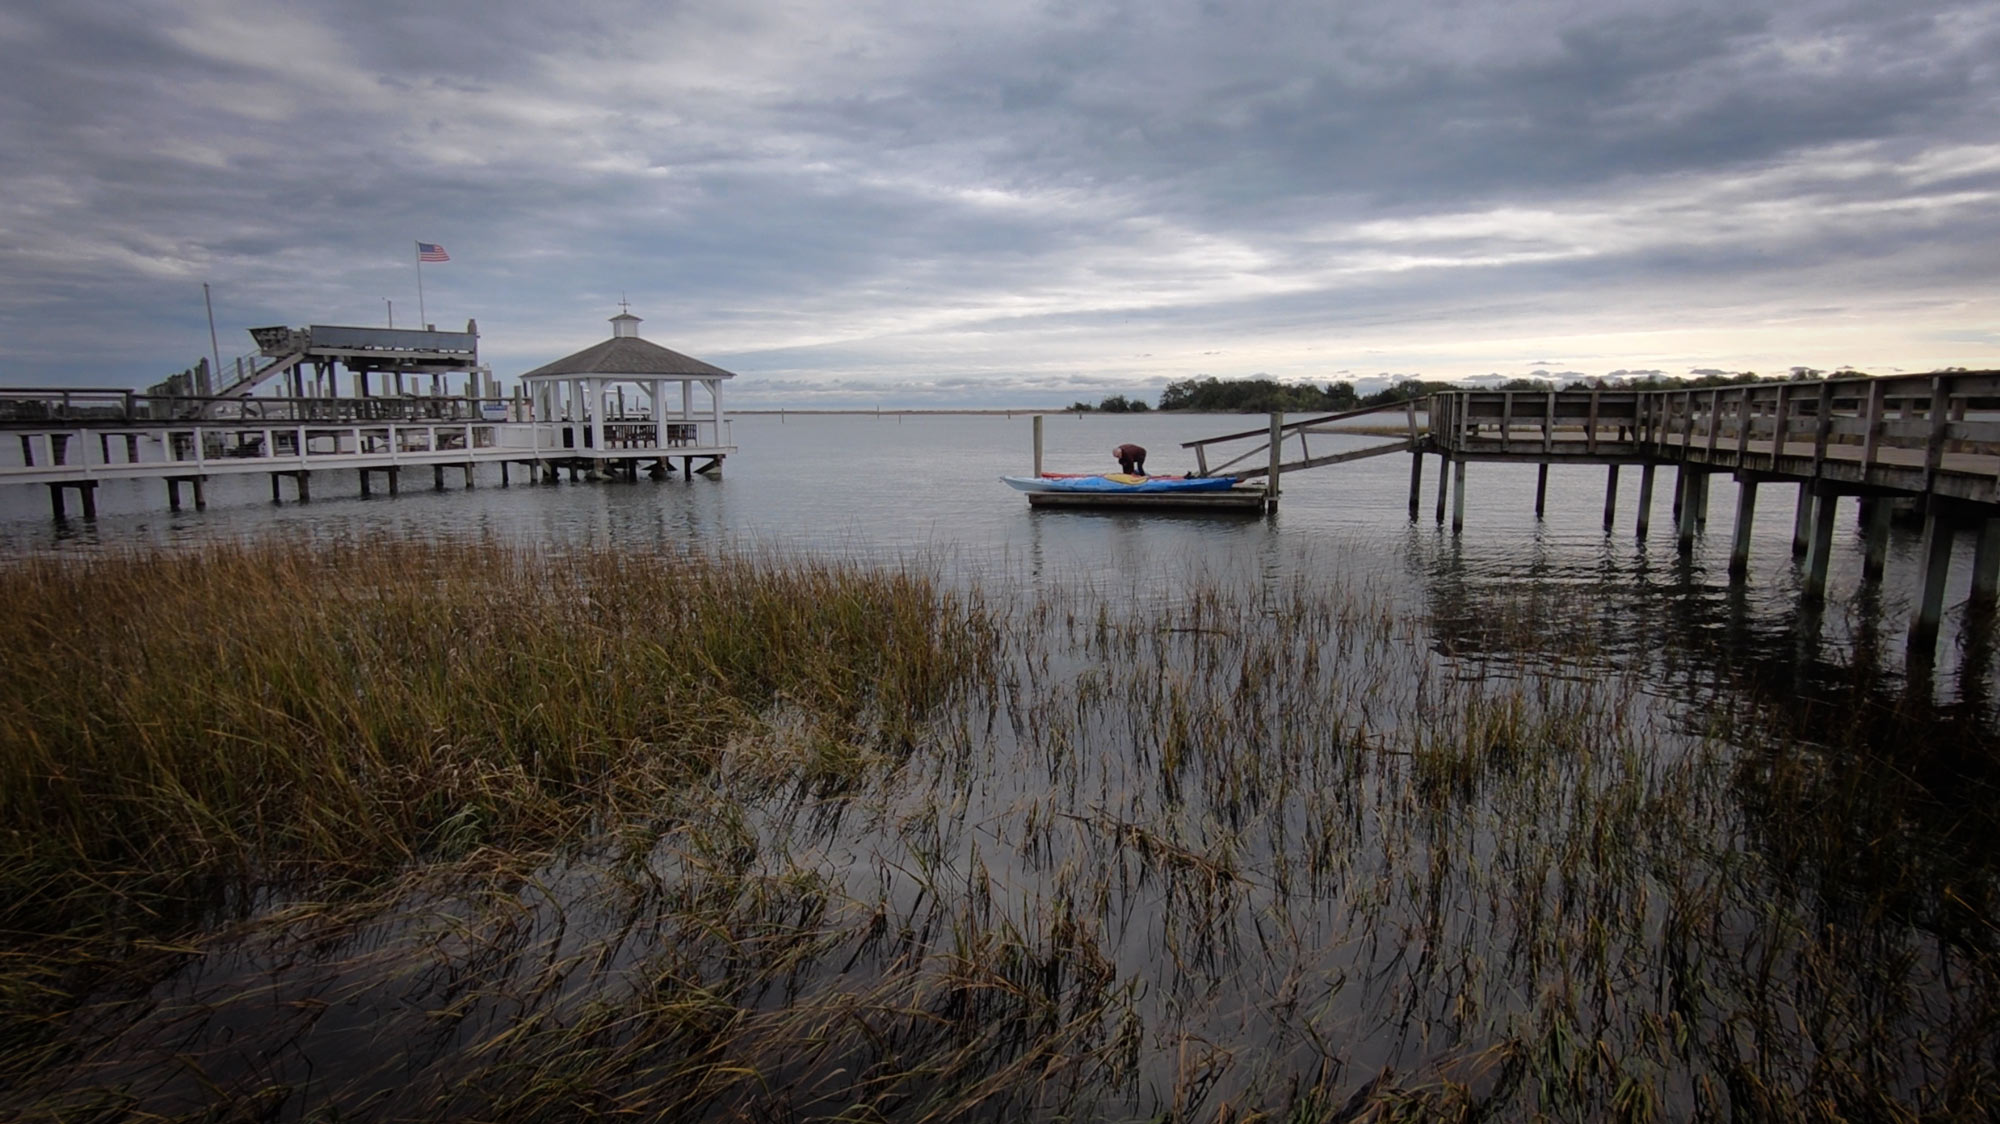 Trails End Public Boat Ramp for Masonboro Island Access, North Carolina